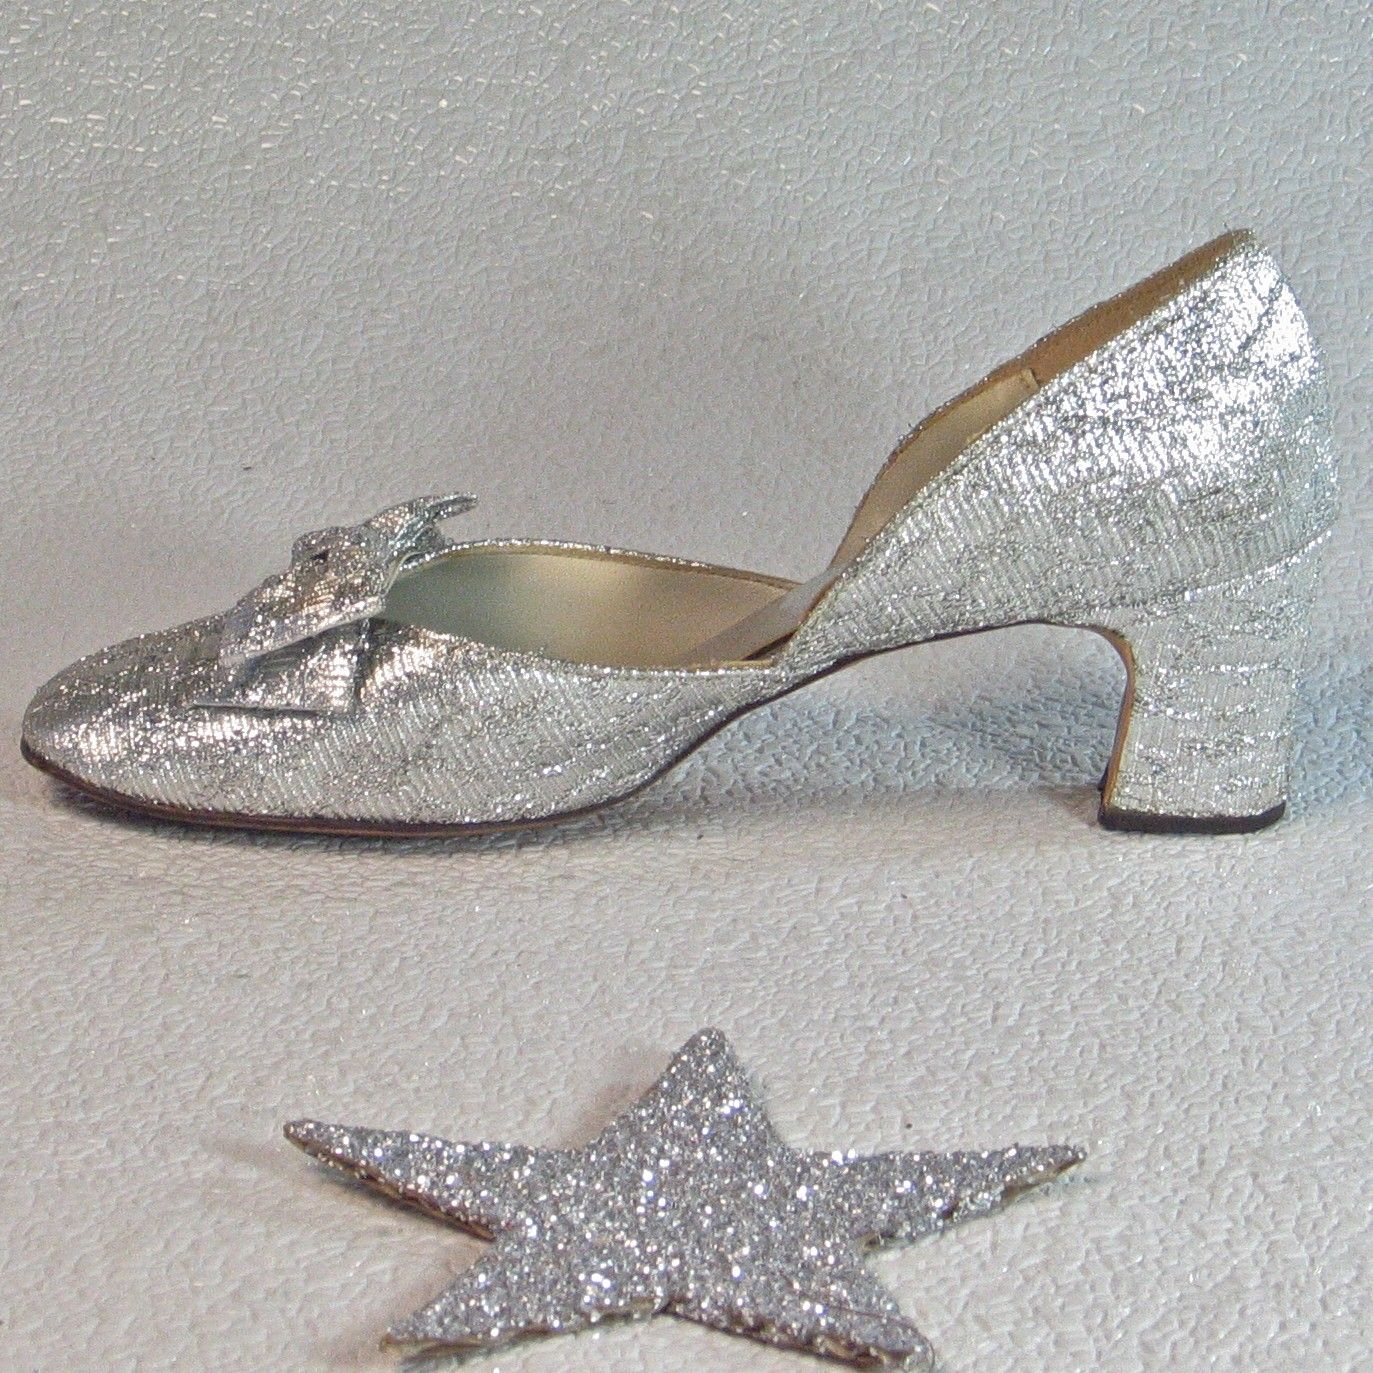 Bridal Shoes Wide Feet: Vintage Shoes Silver 1960's Debutante Shoes Silver Bows